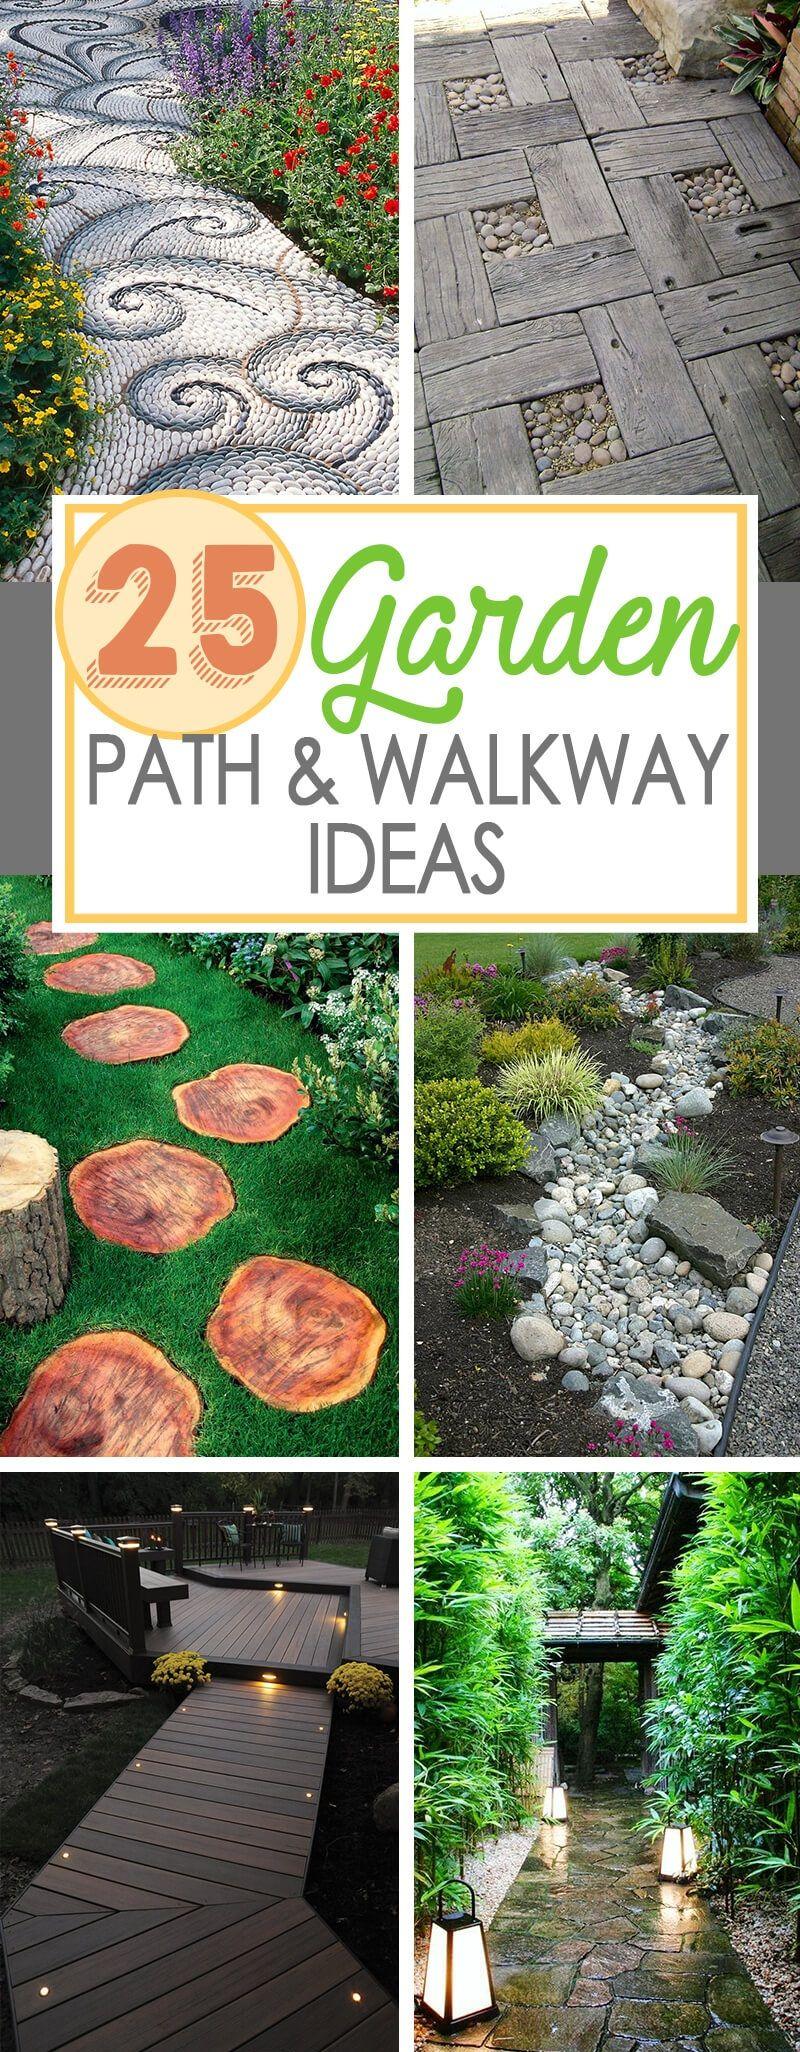 fabulous garden path and walkway ideas pathway ideas garden